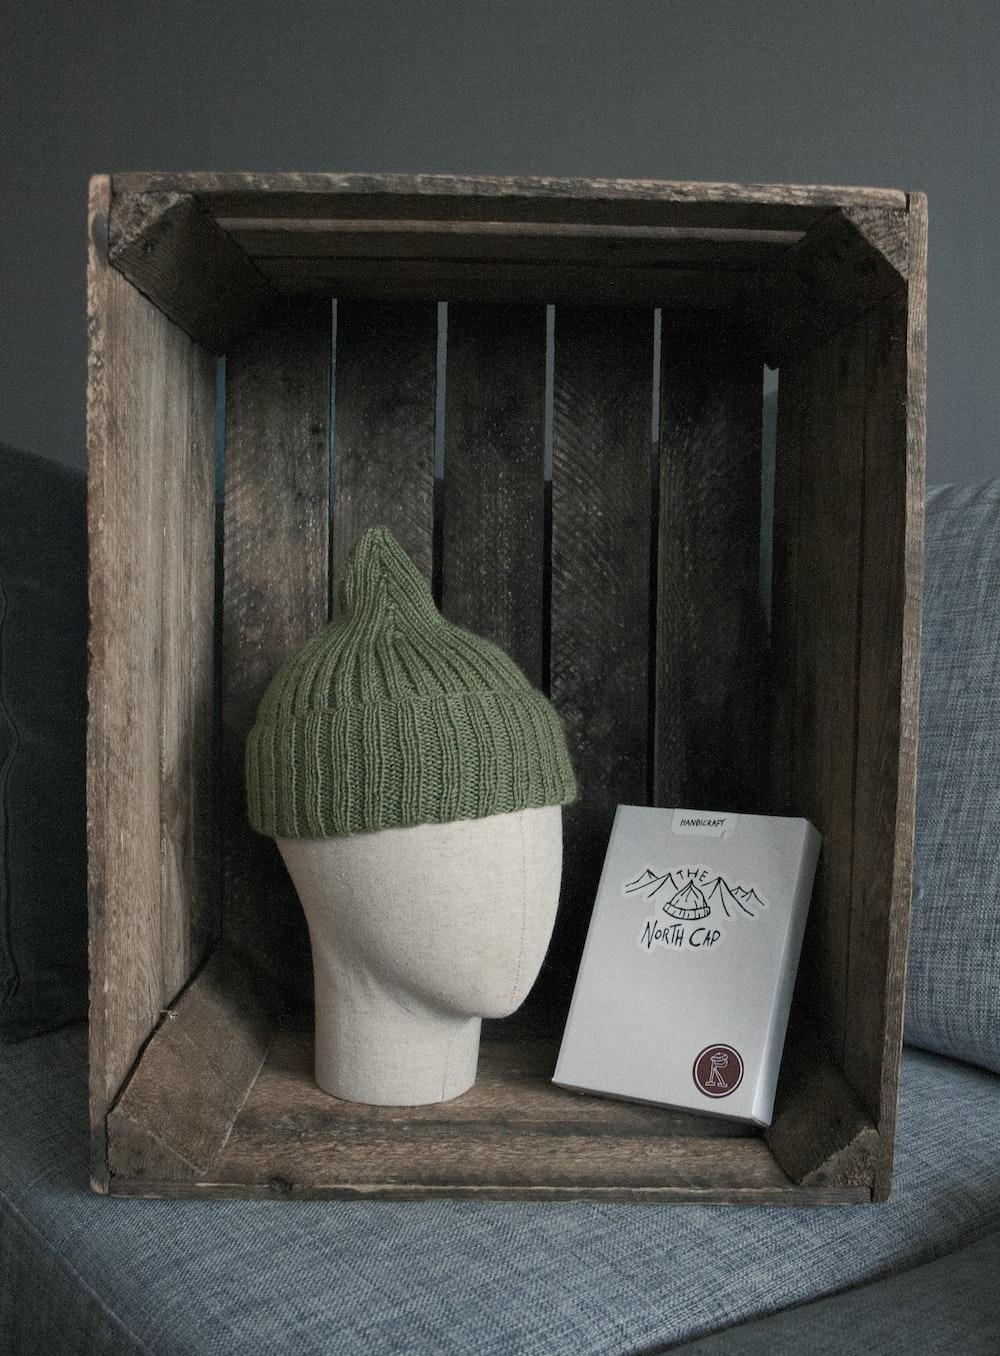 green yarn on white paper